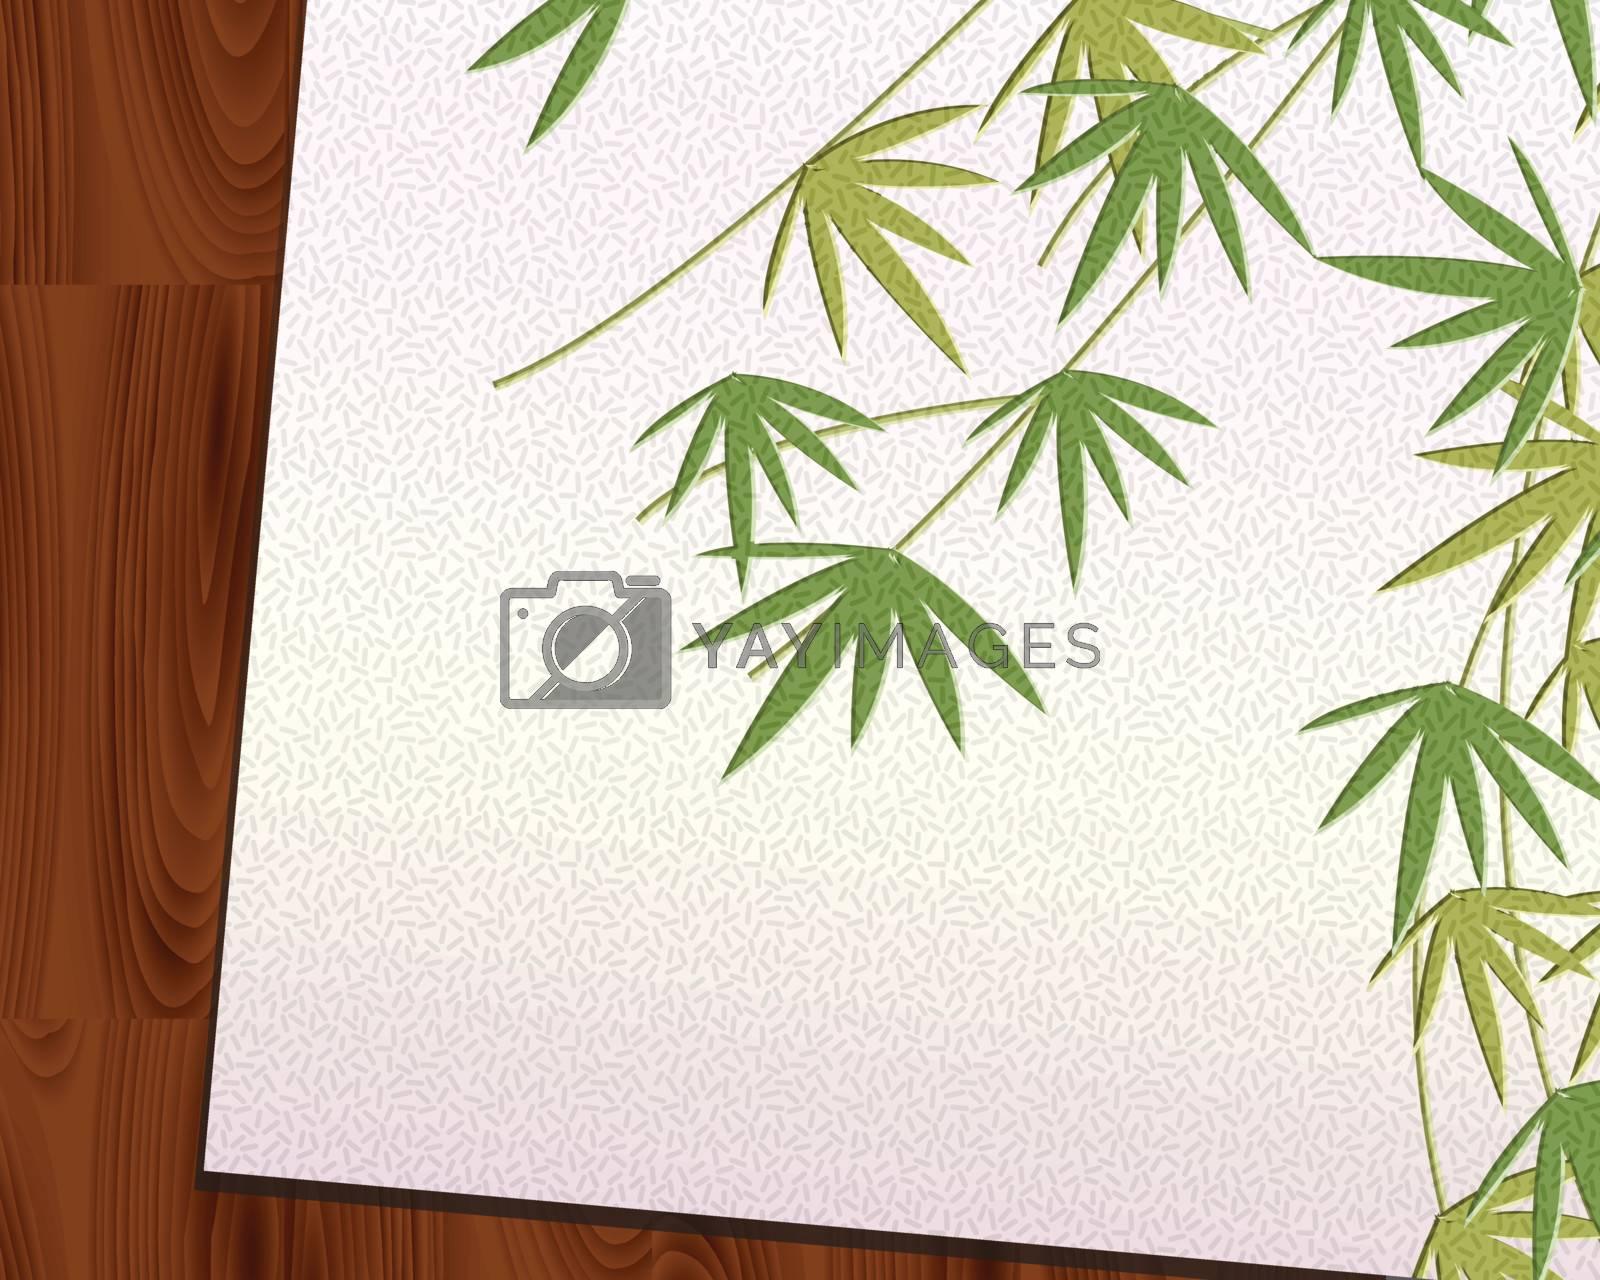 Bamboo leaf imprint on Japanese paper put on Wood